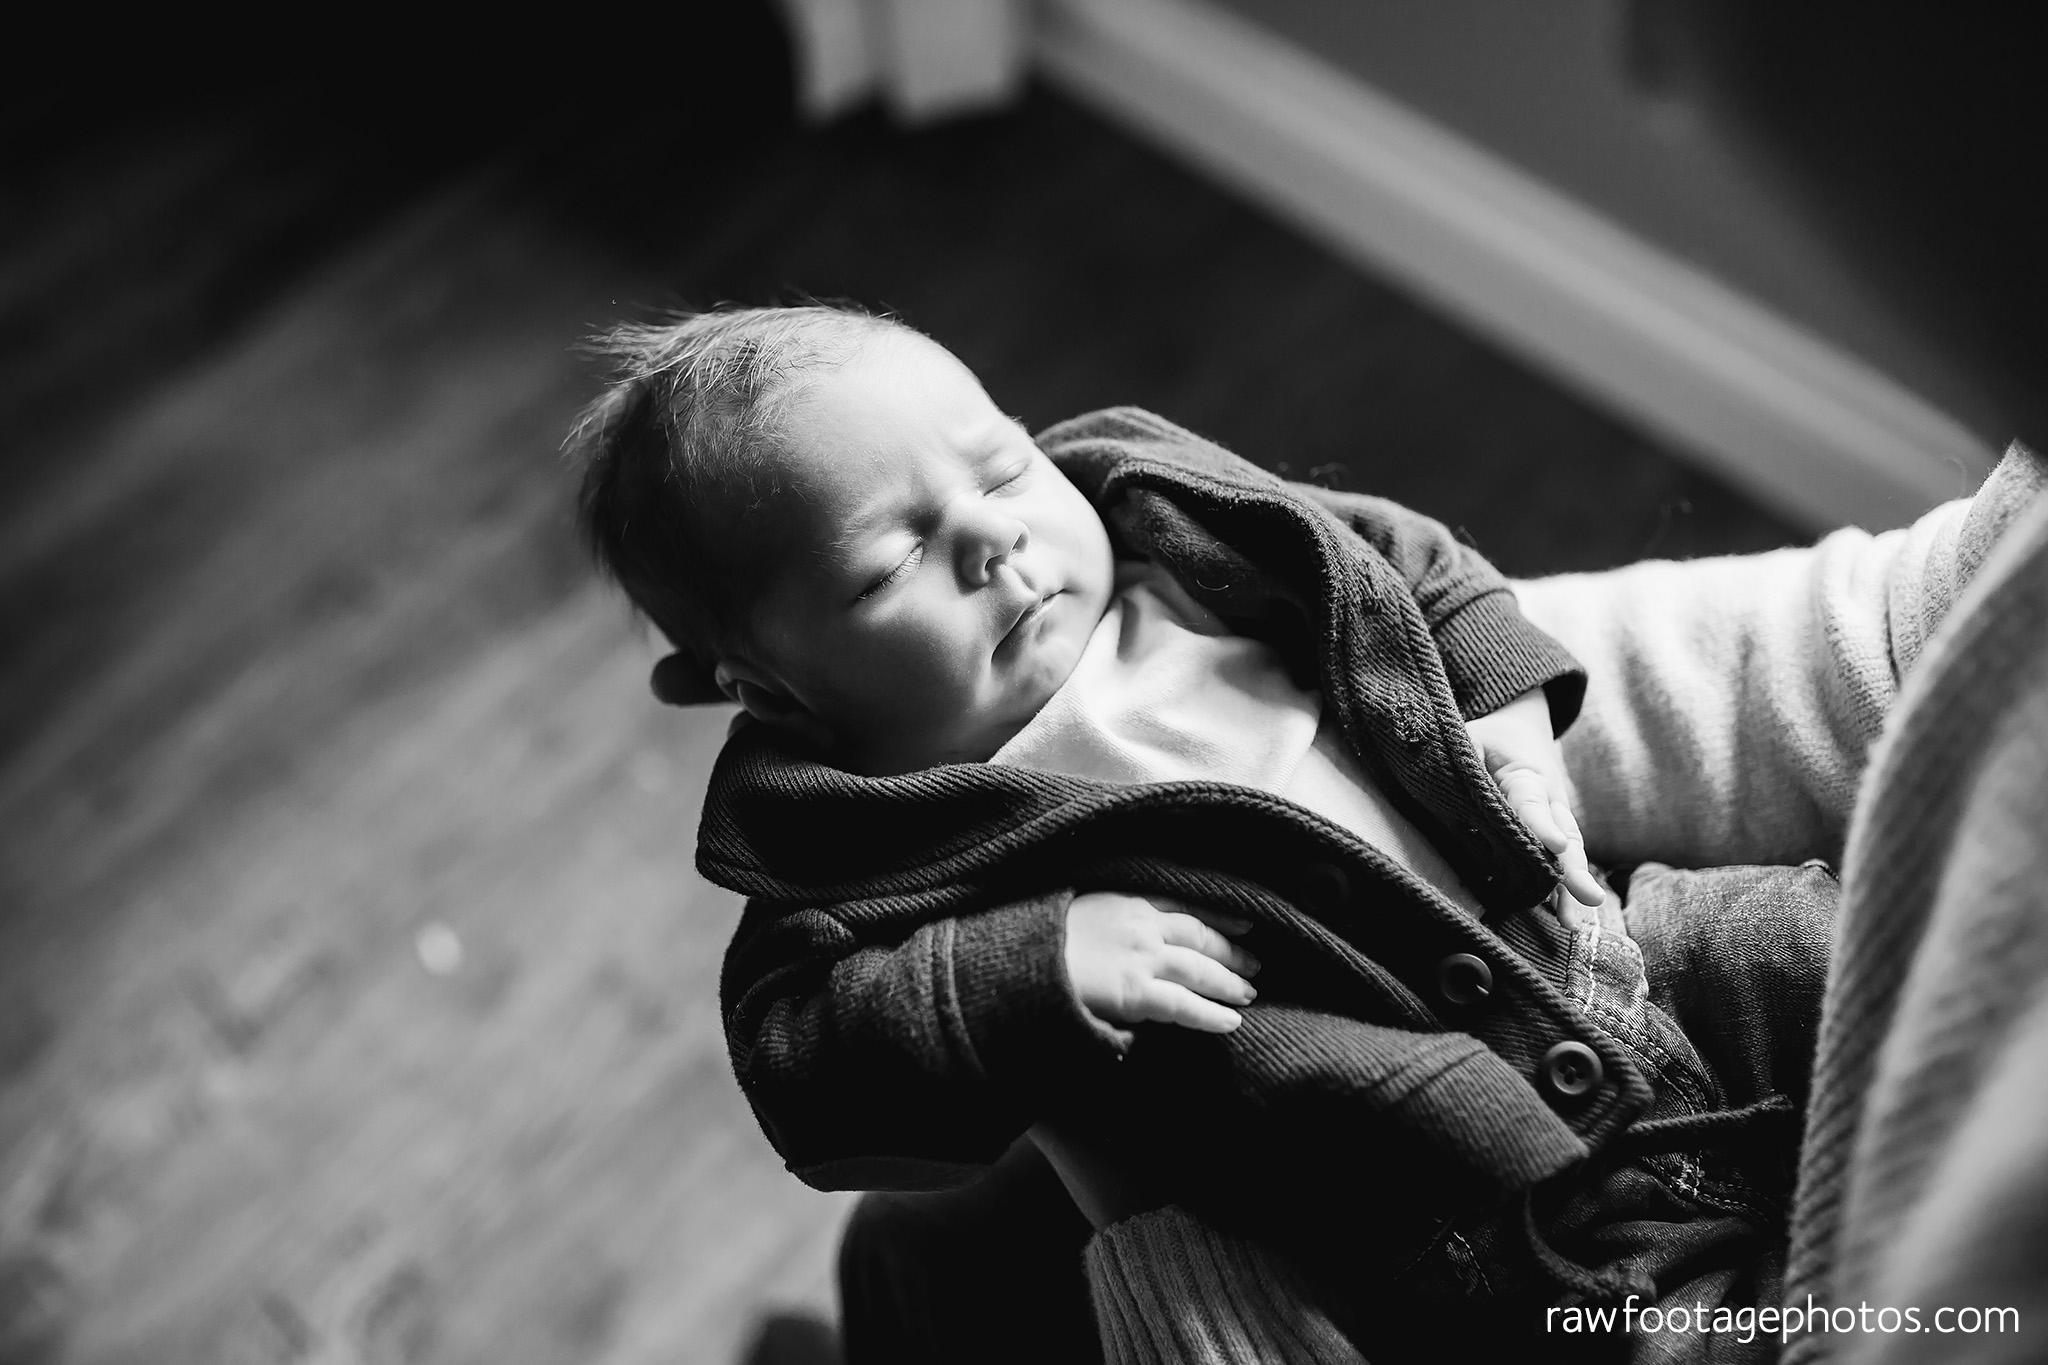 london_ontario_newborn_lifestyle_photographer-best_of_2018-raw_footage_photography011.jpg